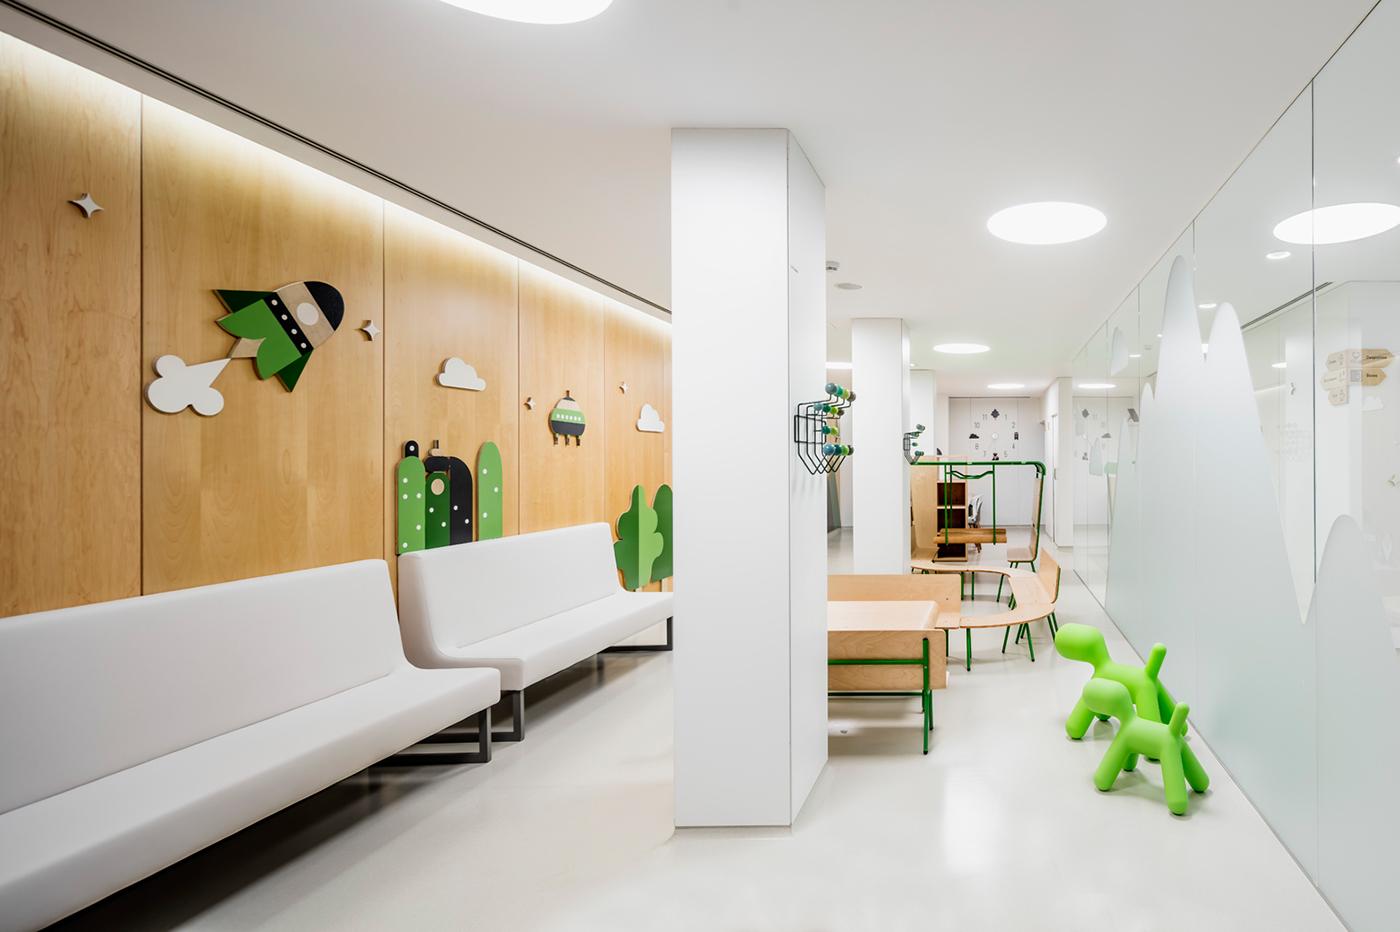 rgb_creative_ParcdAtencions_hospital_design_04